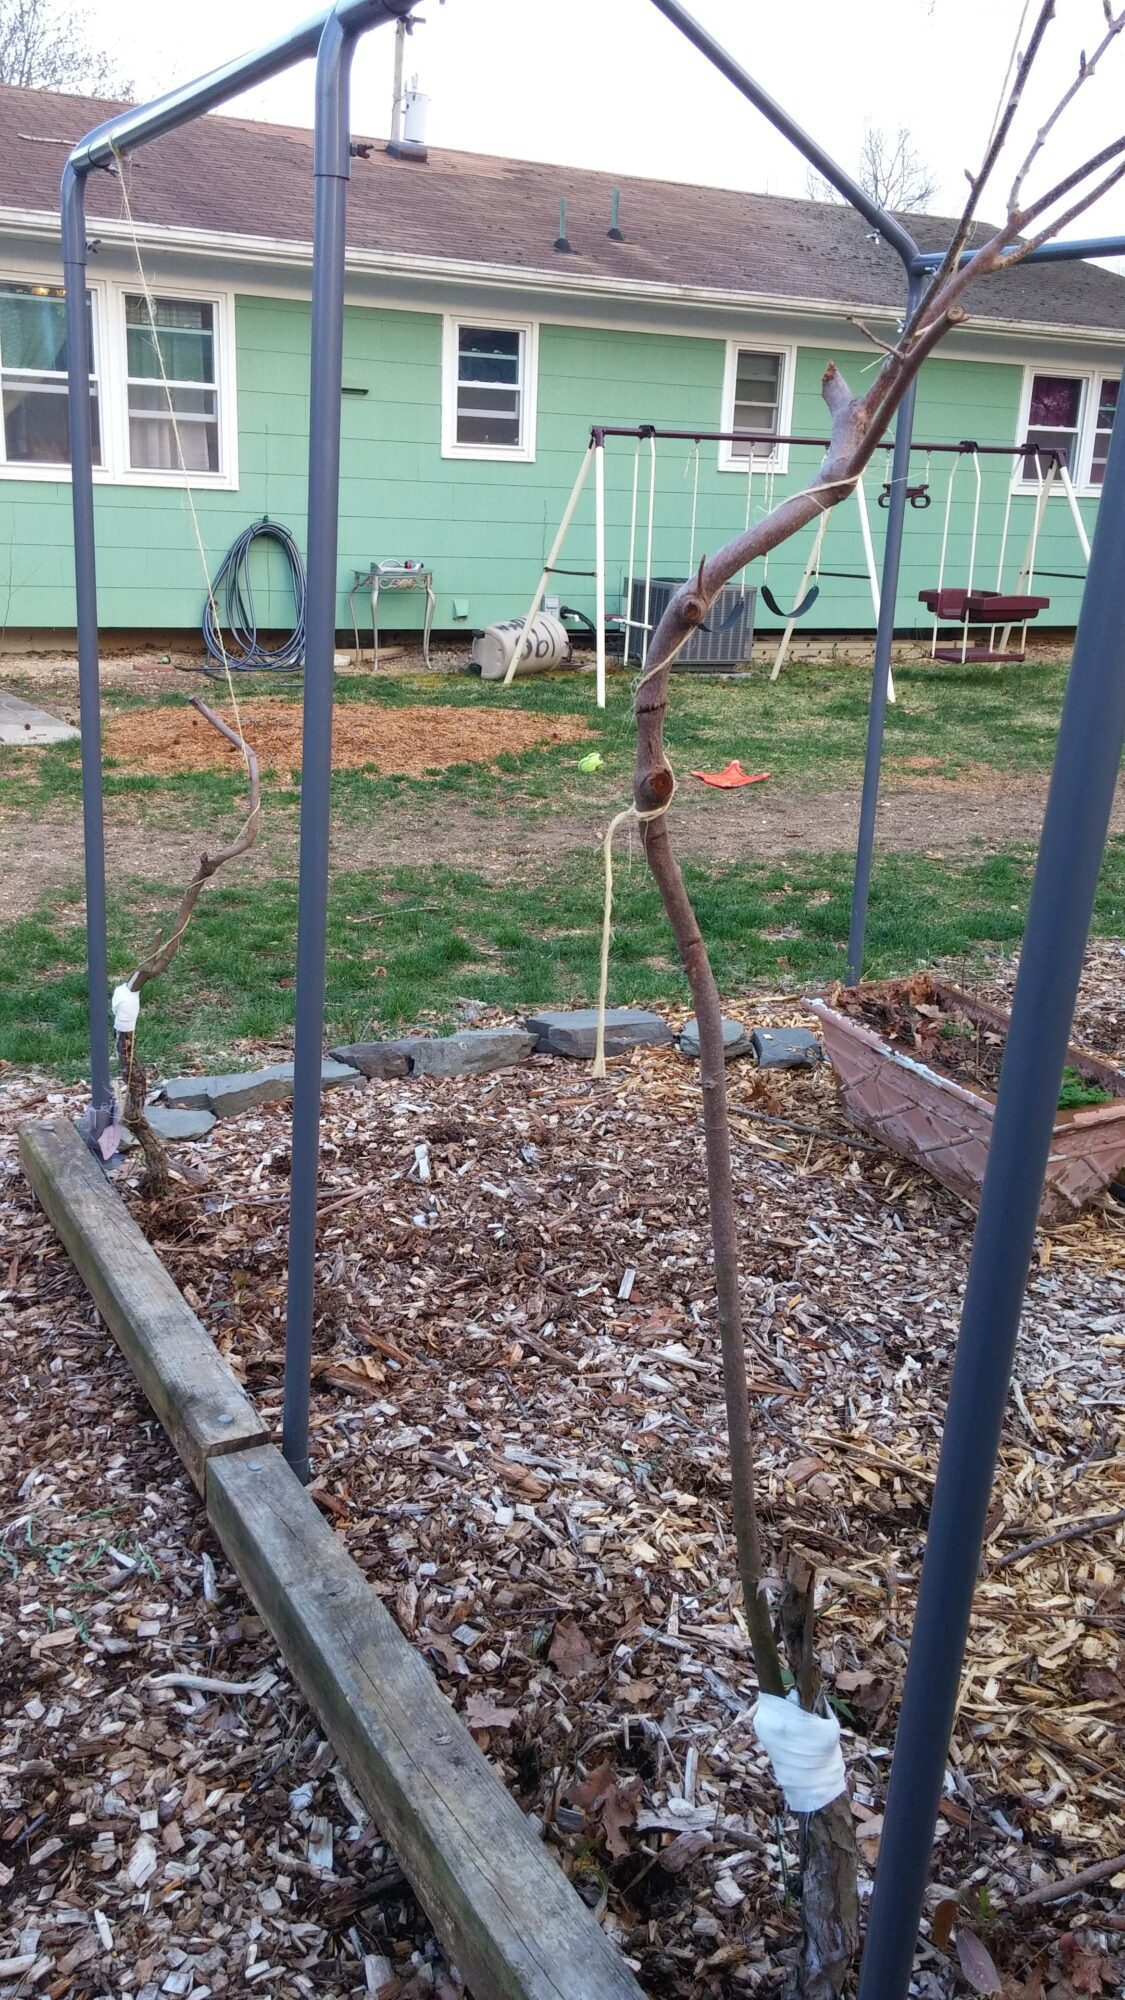 The Hazelnut Gets a Polinator, Earlyglow Strawberries and Maimed Kiwi